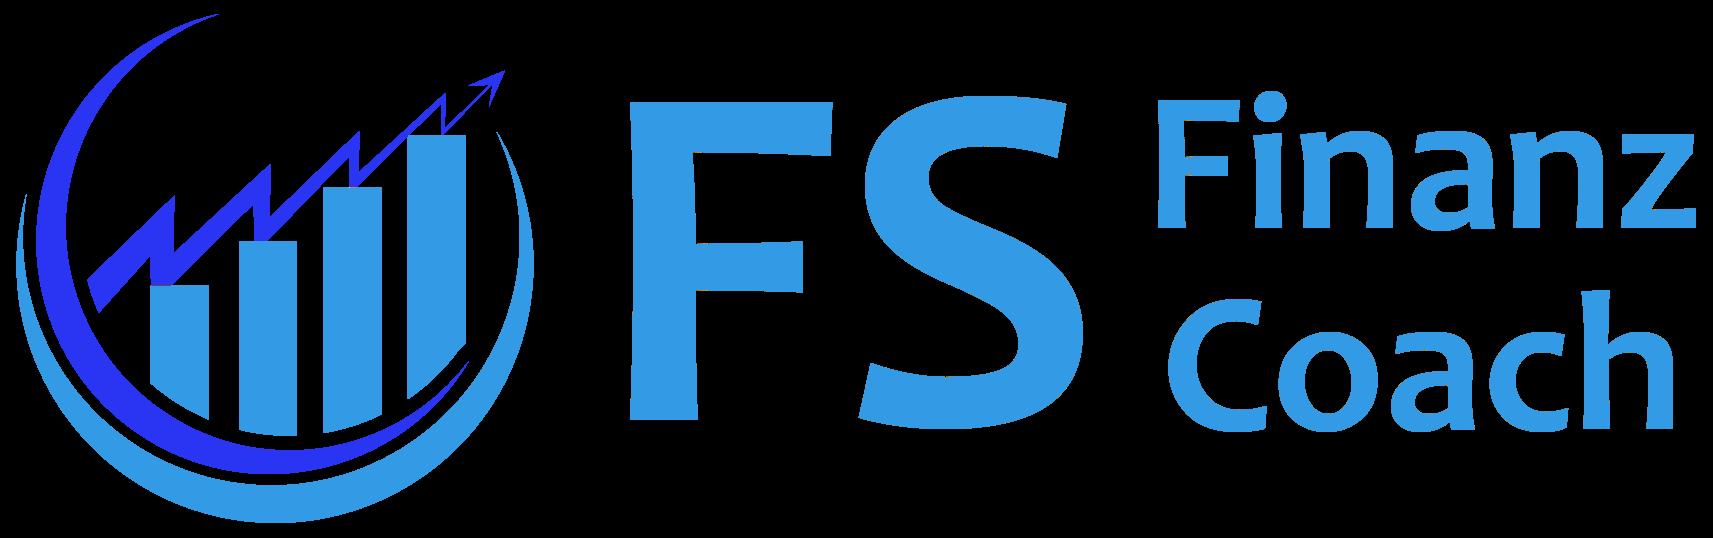 FS Finanz Coach